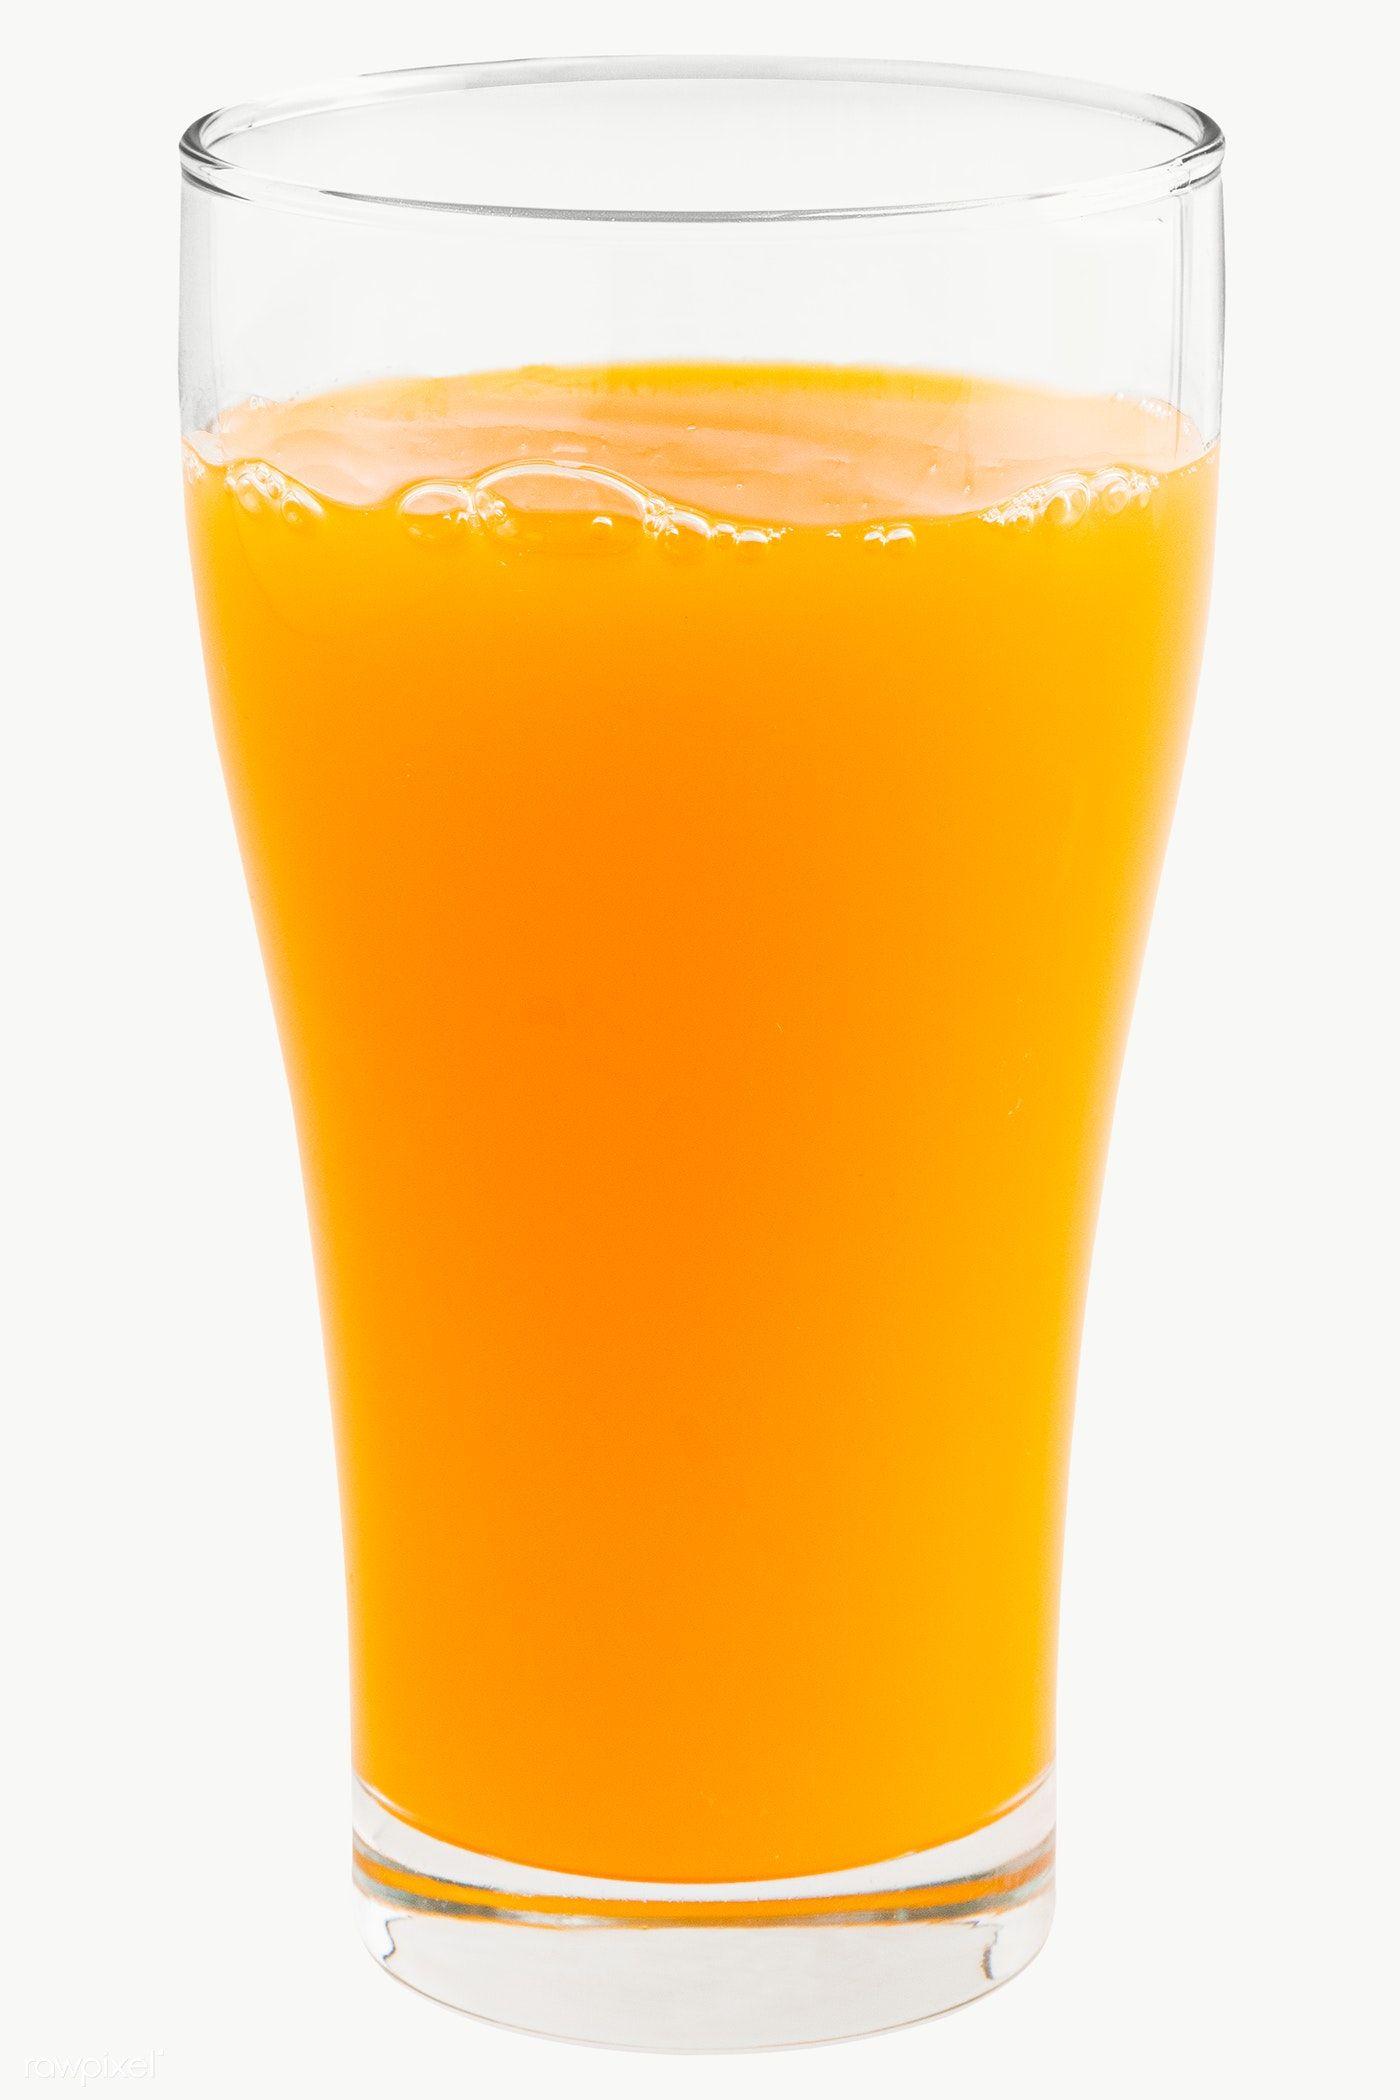 Passion Fruit Mango Juice Recipe Easy Guidance To A Vitamin Boot Mango Juice Passion Fruit Juice Mango Juice Recipe